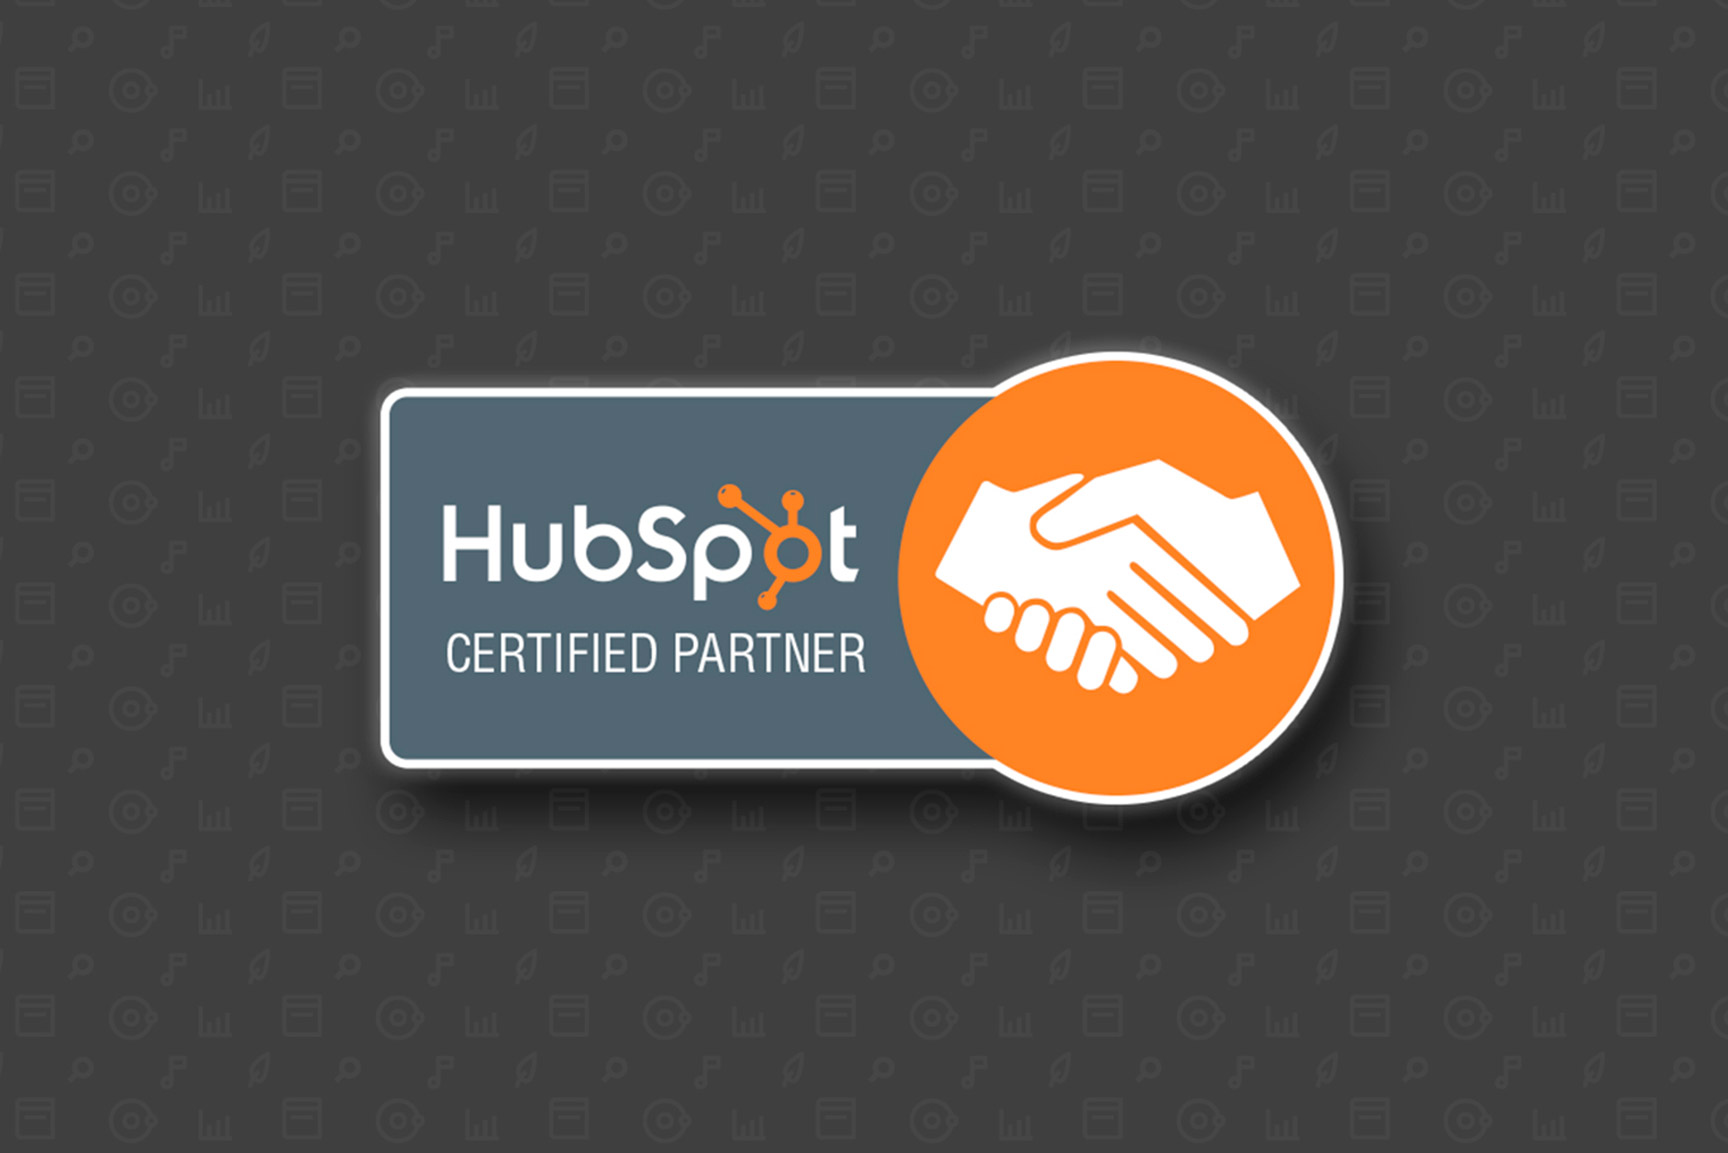 h_en_pragma_somos_partner_certificados_de_hubspot.jpg